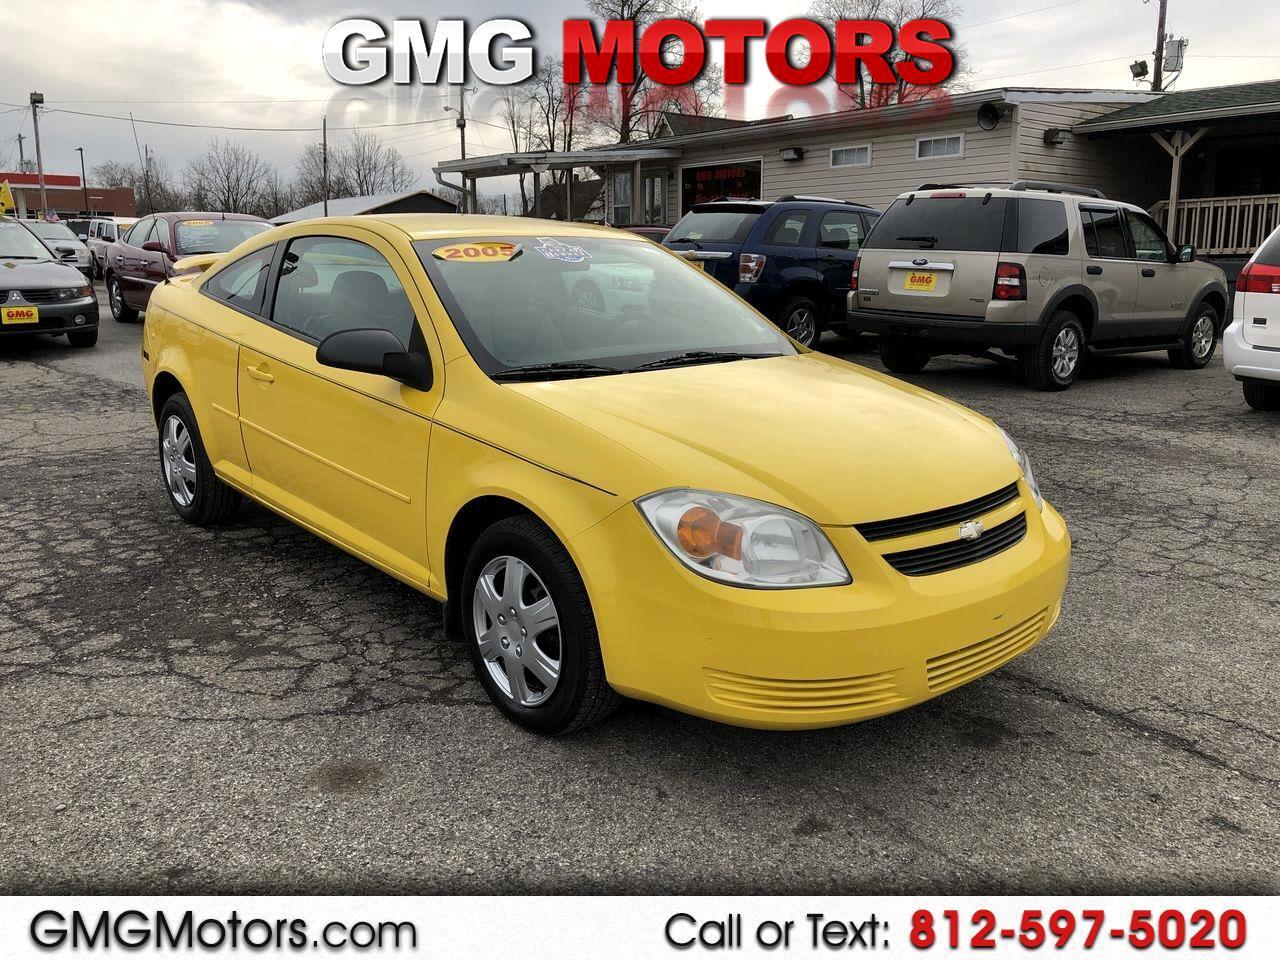 2005 Chevrolet Cobalt 2dr Cpe